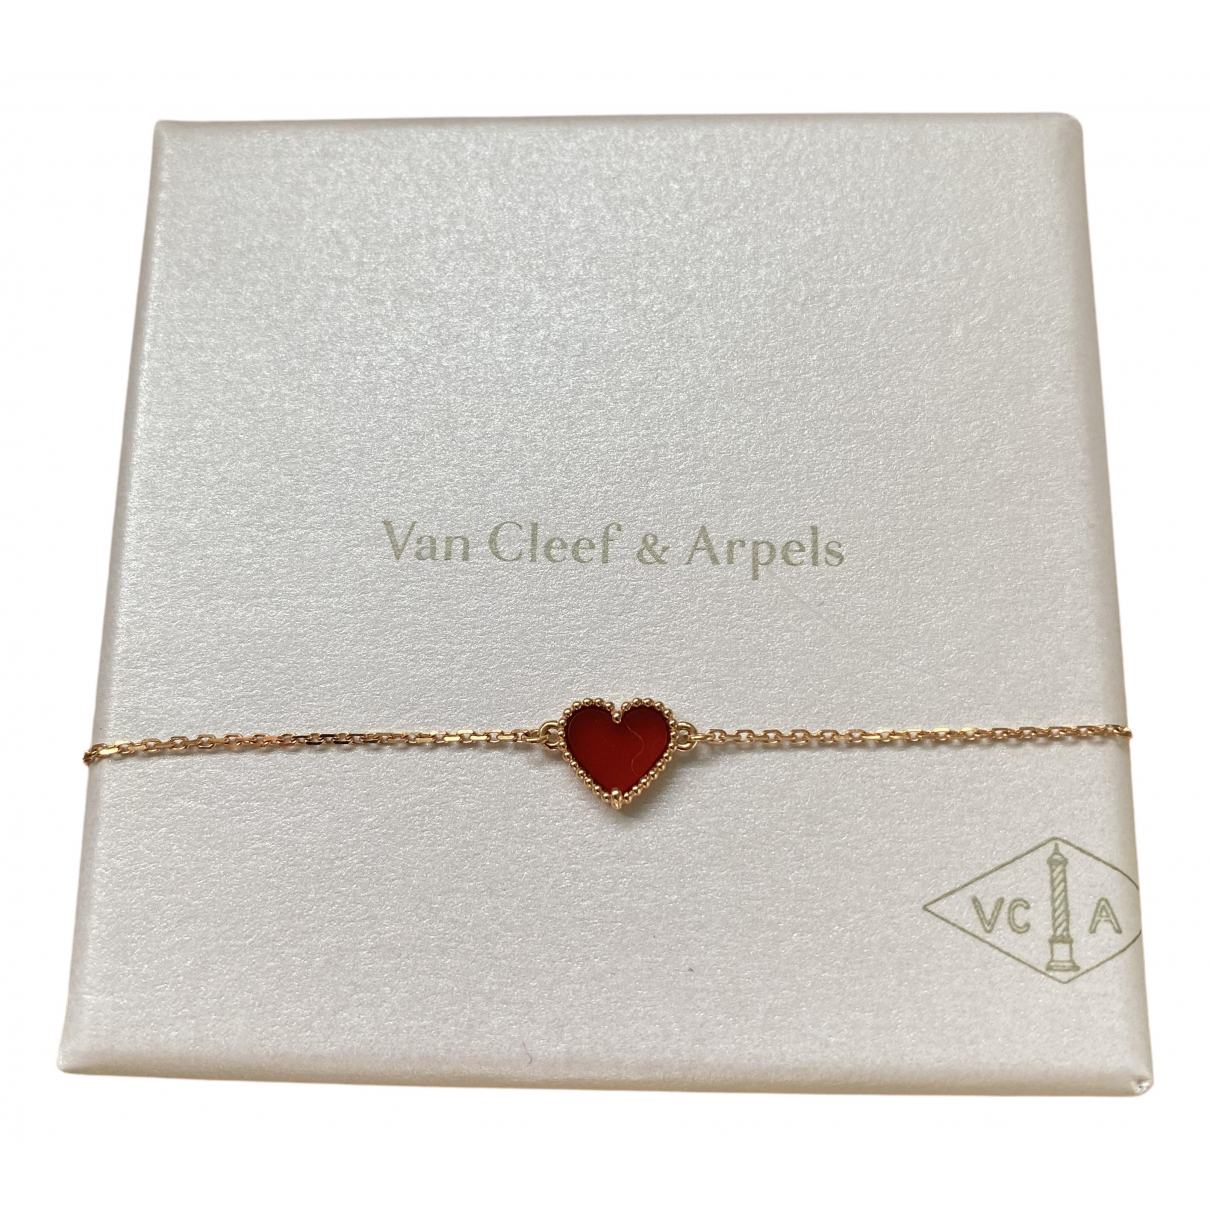 Pulsera Van Cleef & Arpels